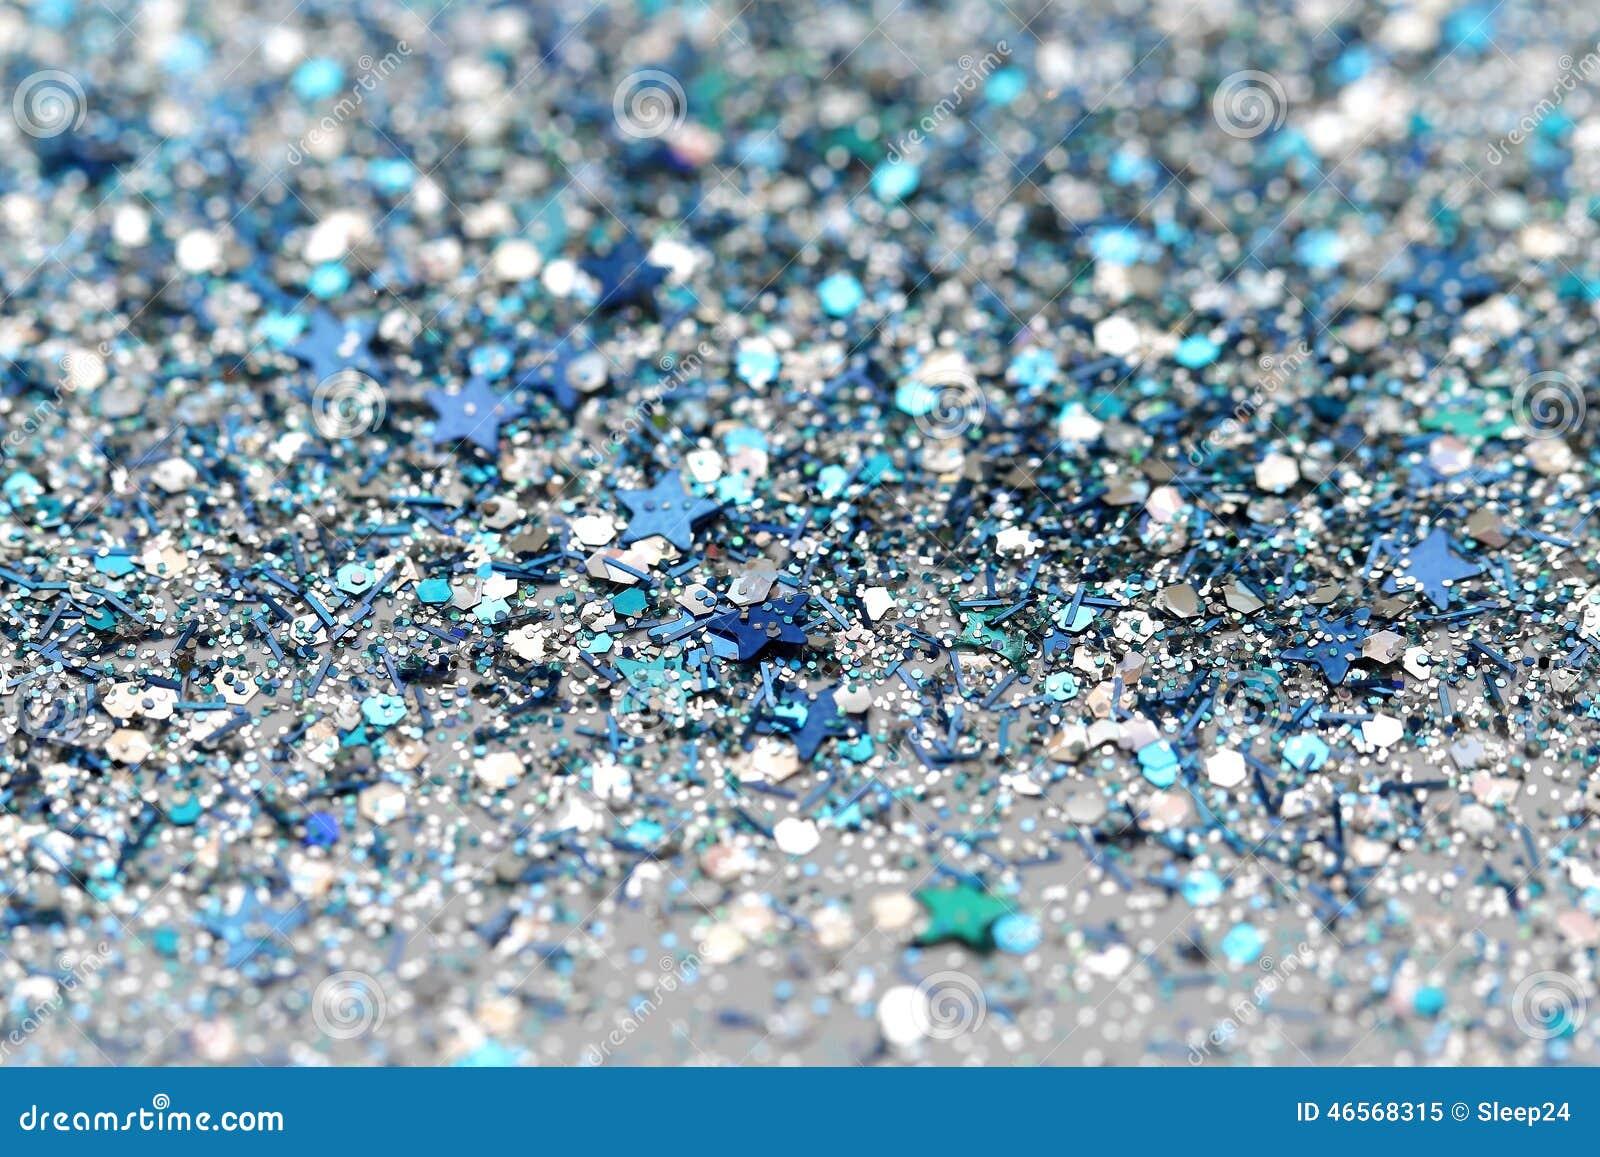 sparkling snow desktop wallpaper - photo #36